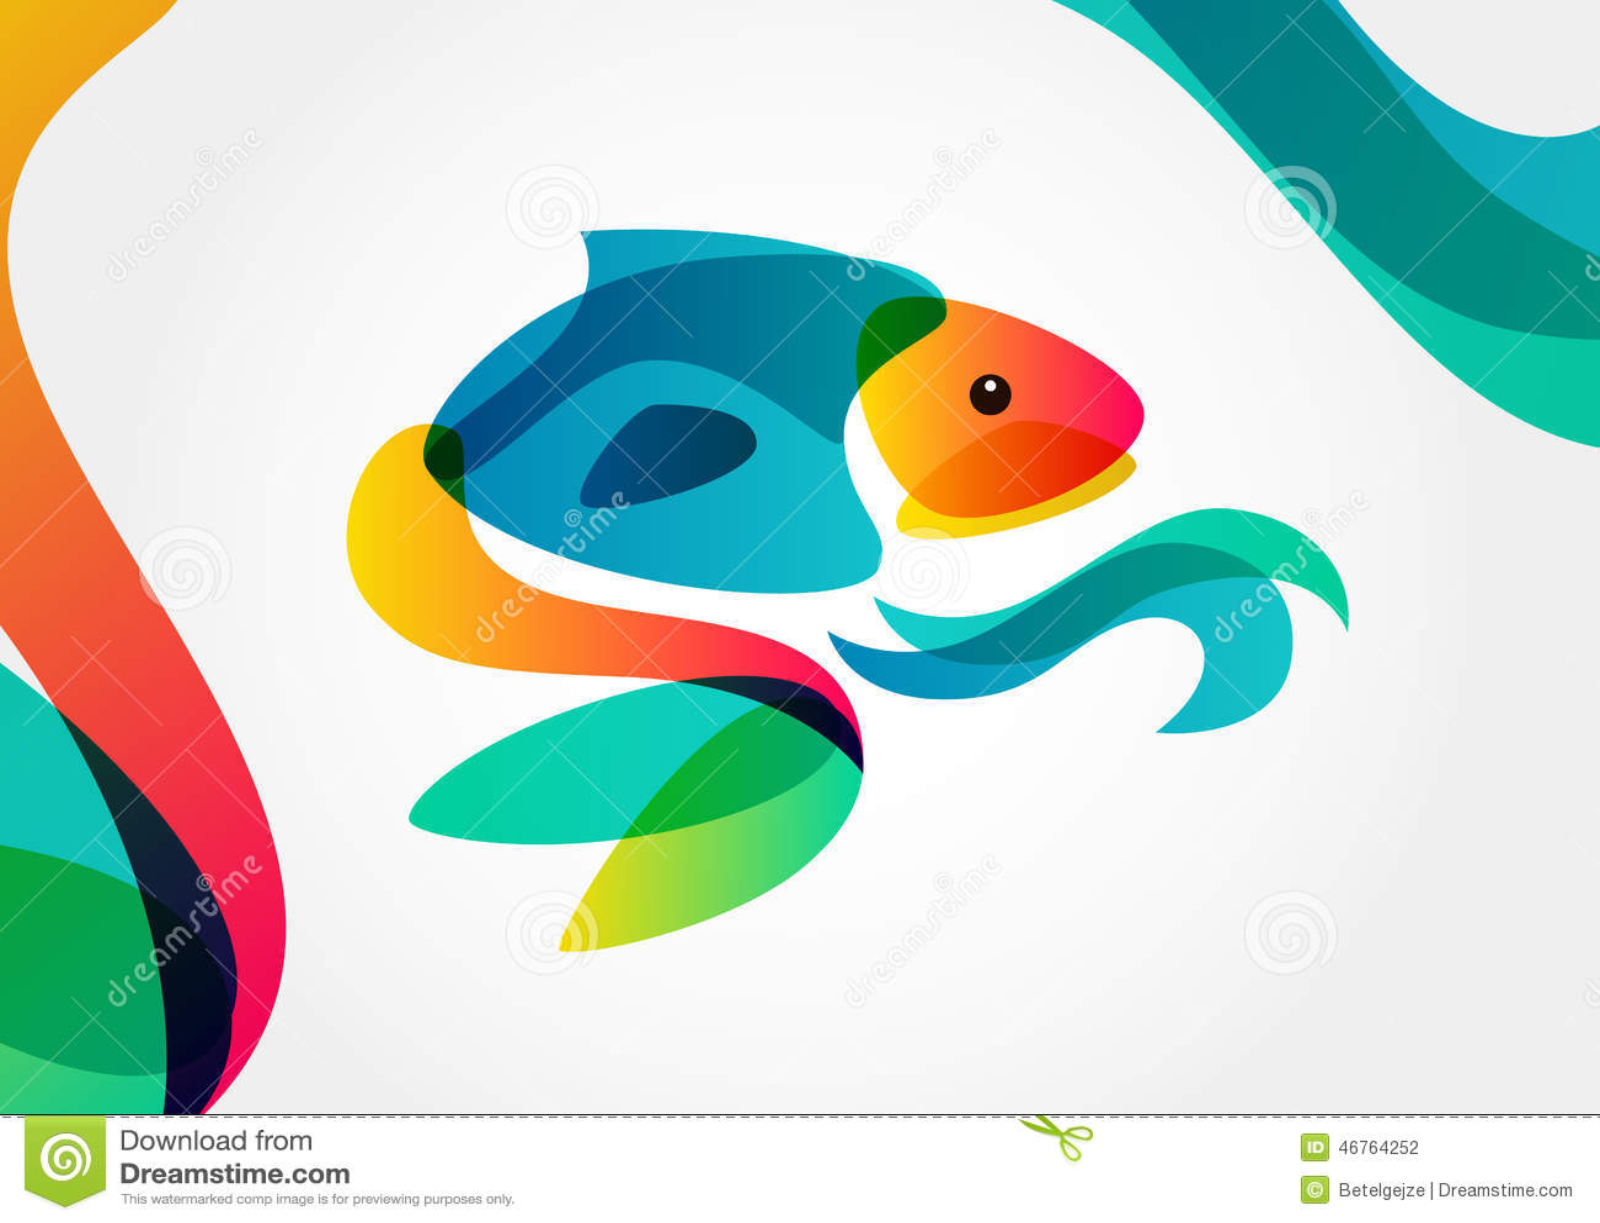 Abstract fish designs - photo#7